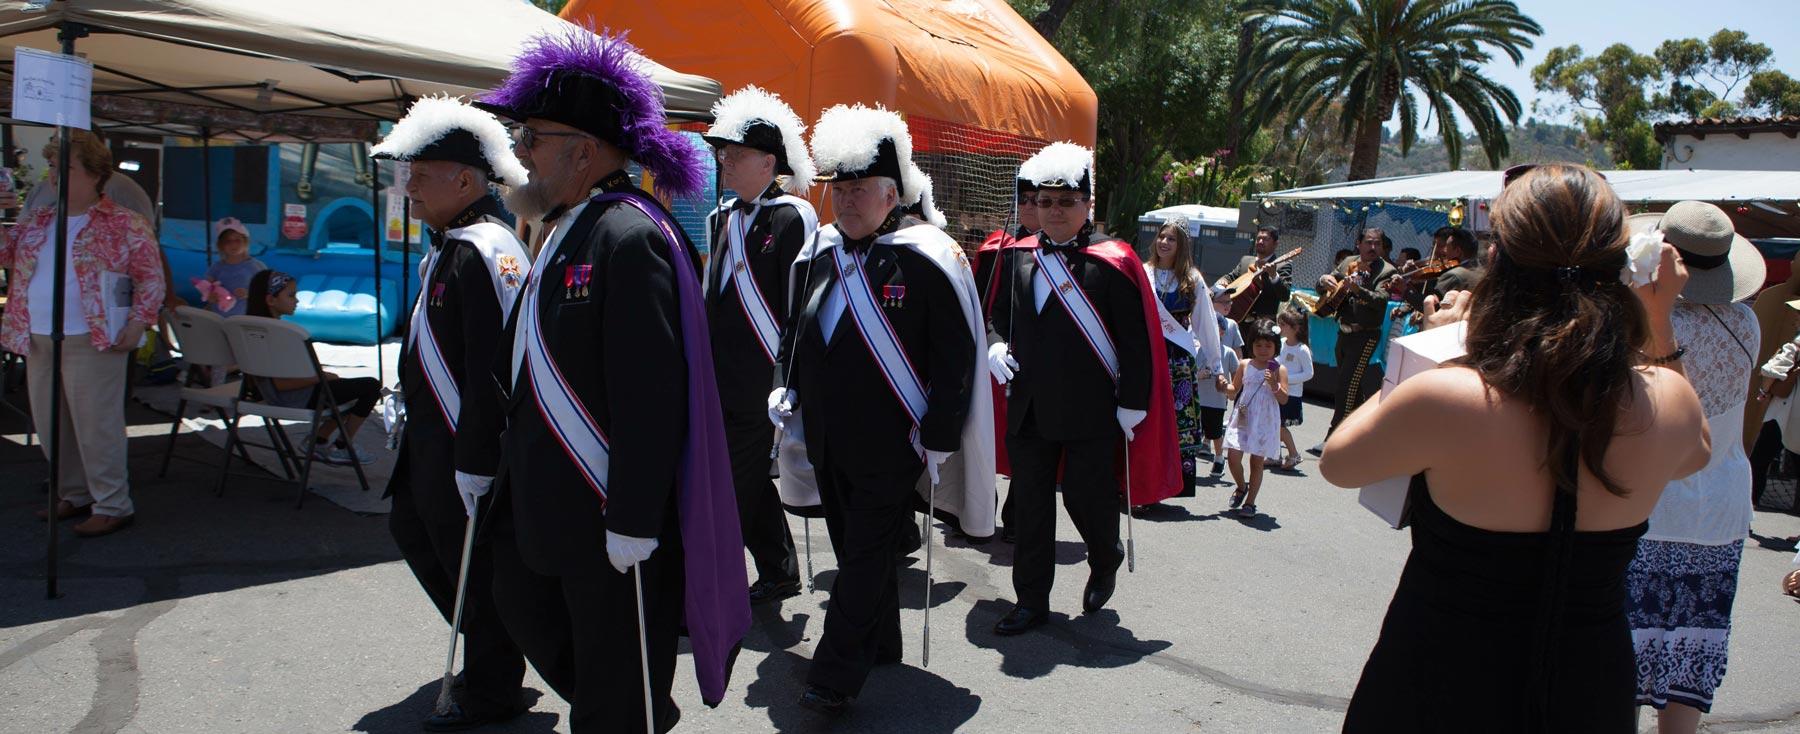 Mission San Diego de Alcala Festival of the Bells